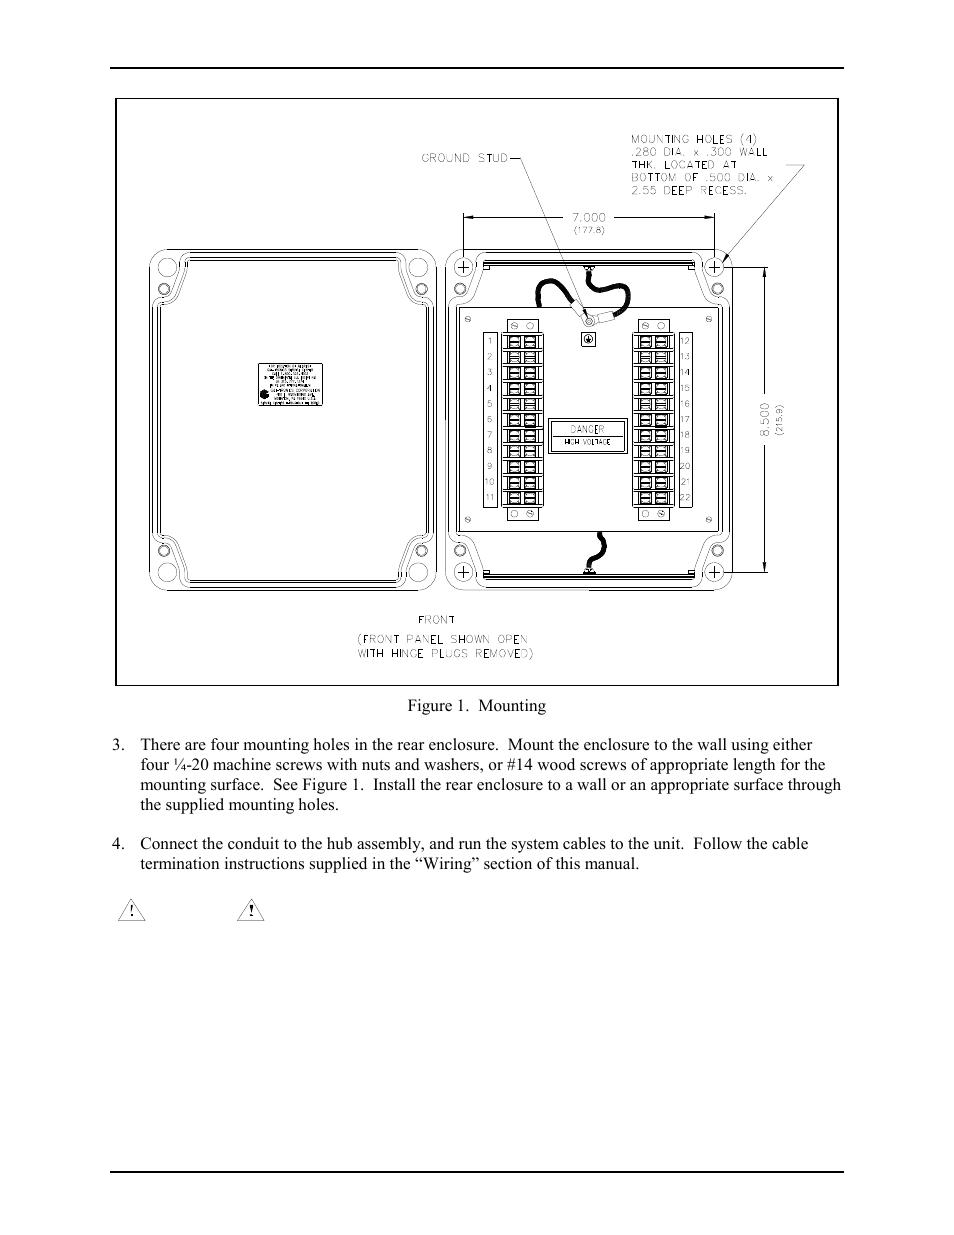 GAI-Tronics 9974 Junction Box User Manual | Page 2 / 5